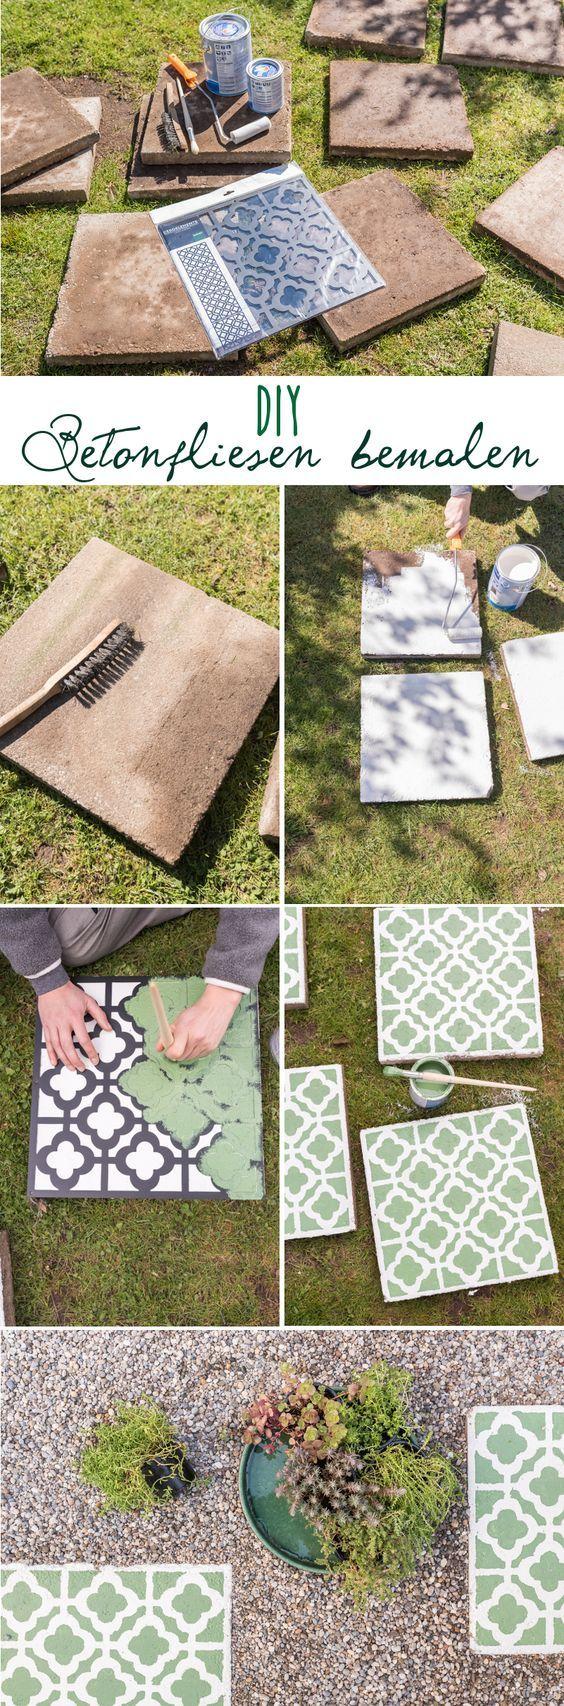 DIY - Betonplatten upcycling für den Garten #hofideen